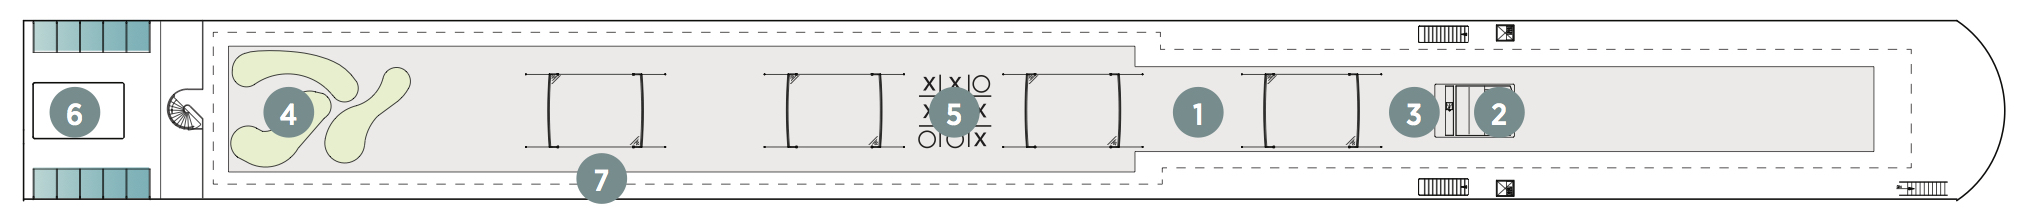 Emerald Sun-deckplan-Sun Deck